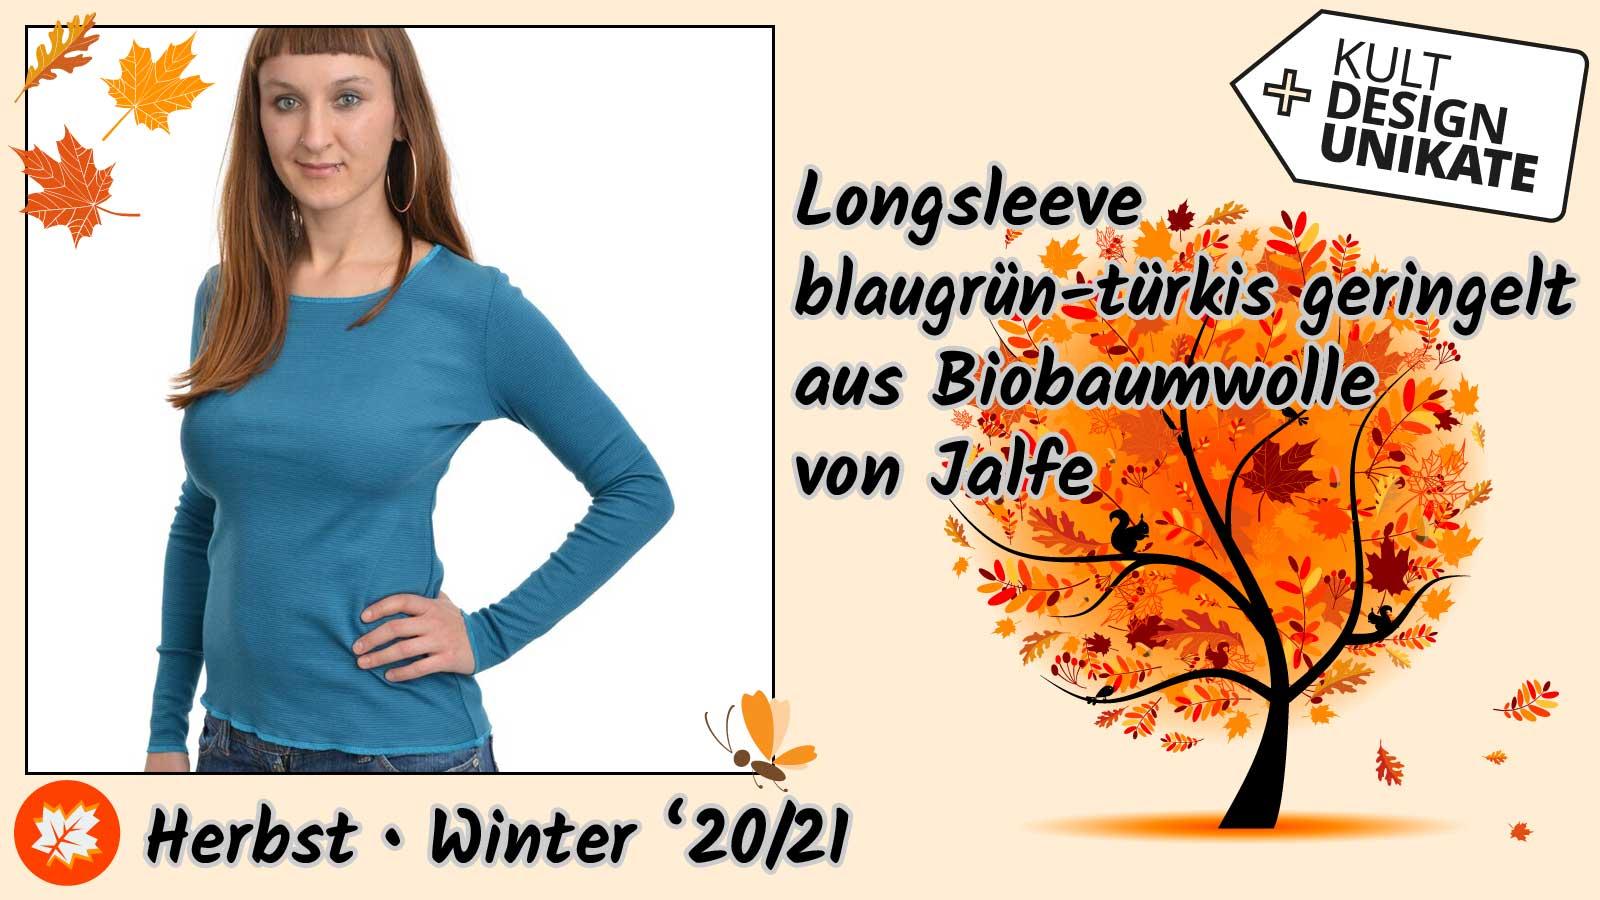 Jalfe-Longsleeve-blaugruen-tuerkis-geringelt